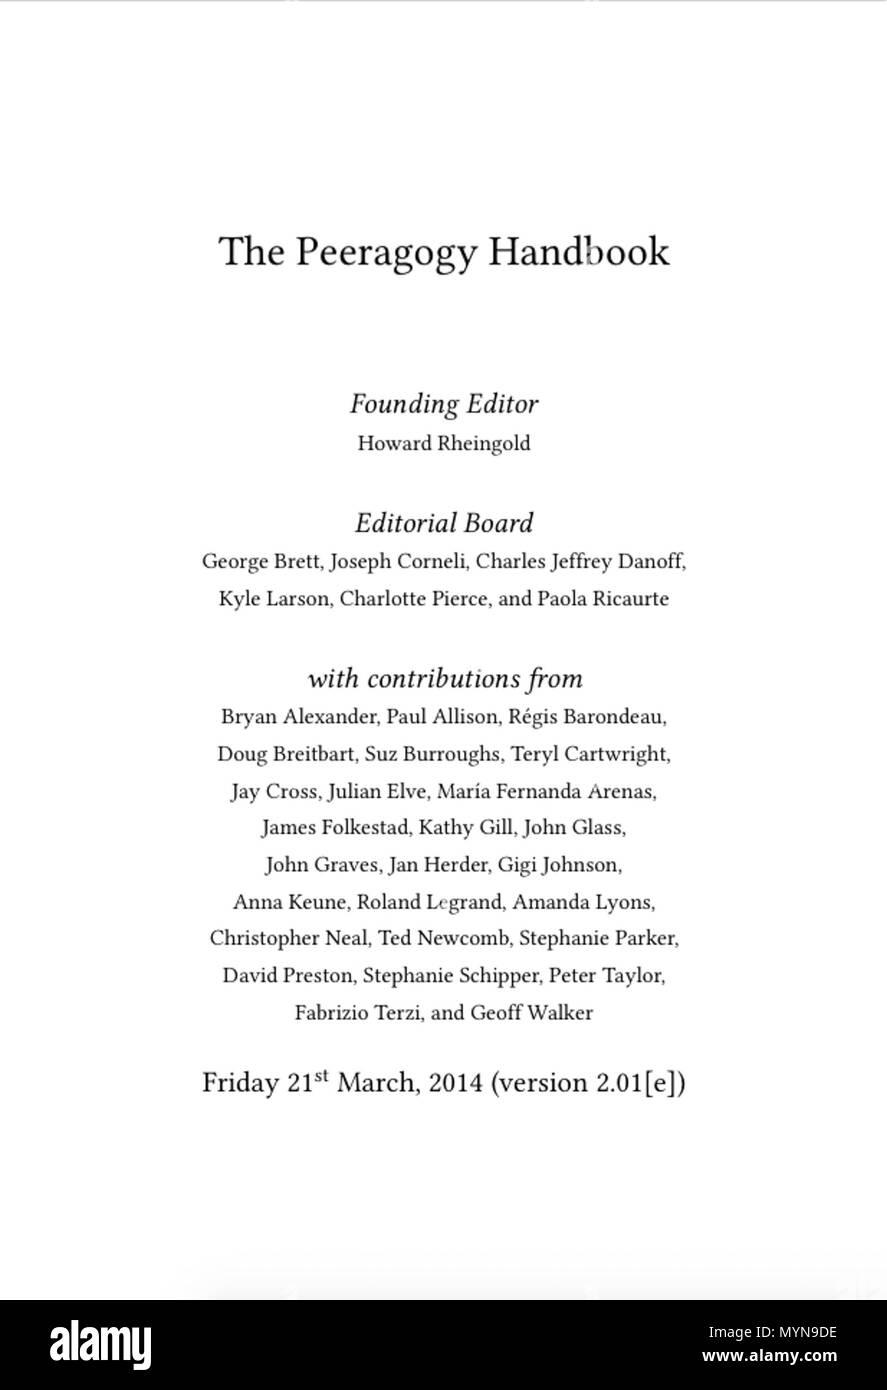 Français Page De Garde Du Peeragogy Handbook 21 March